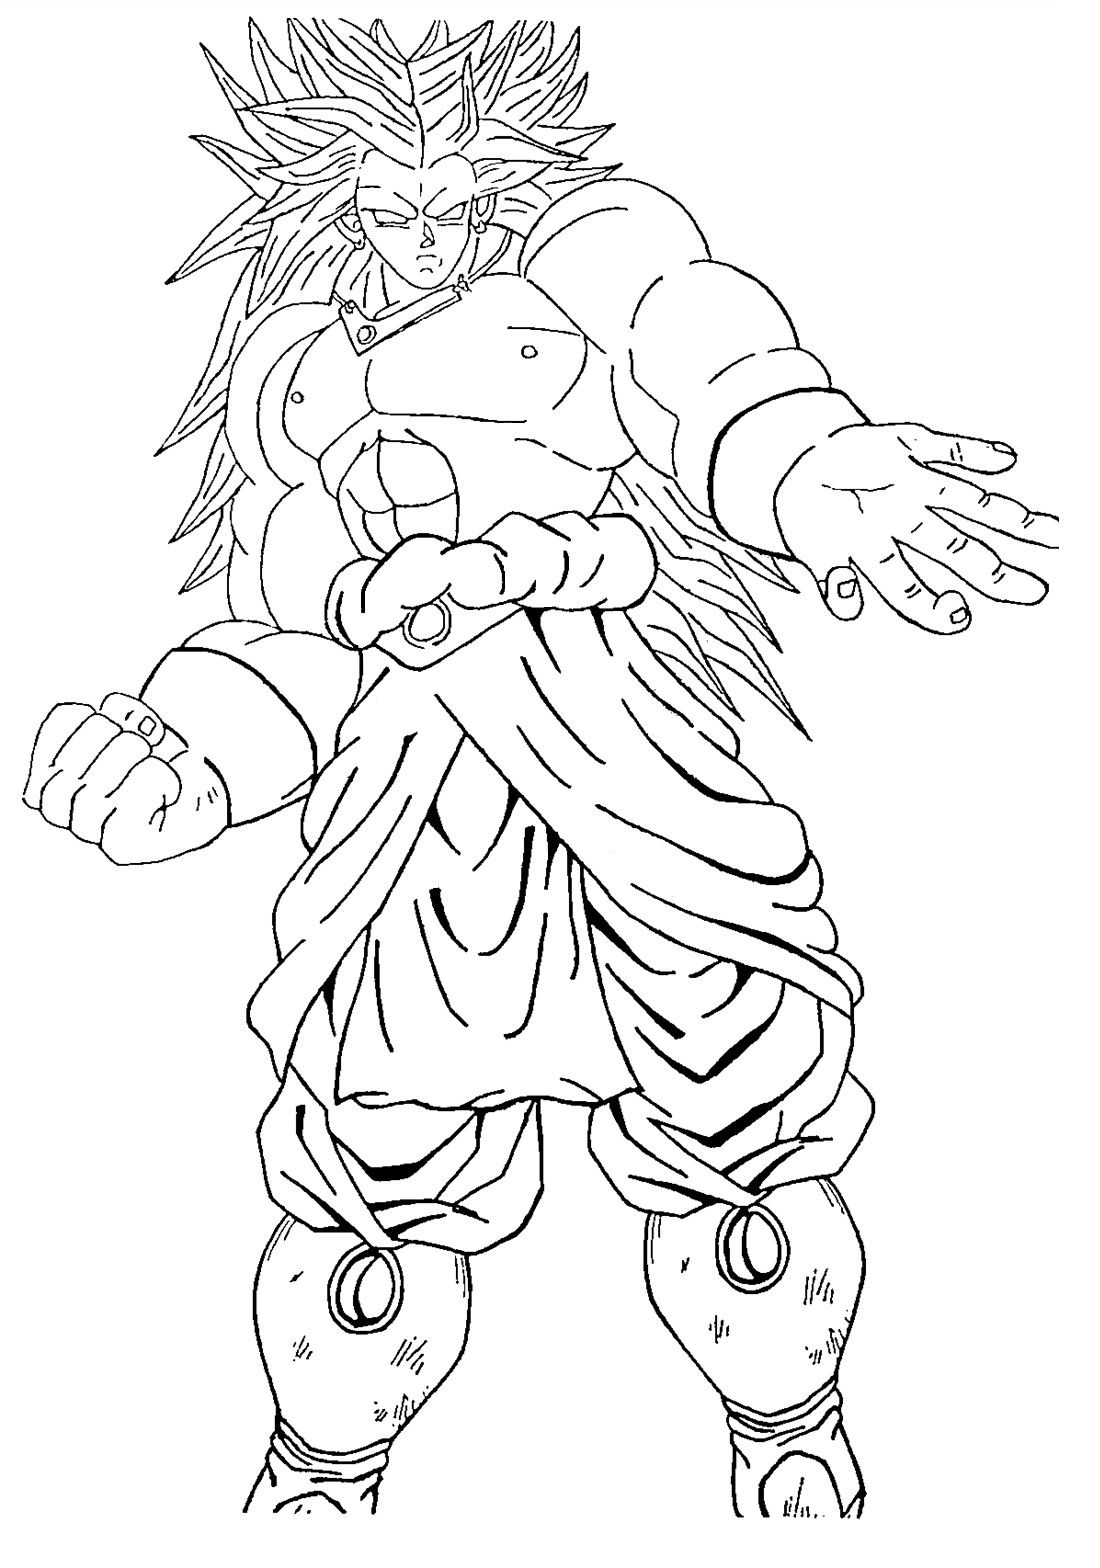 Broly SSJ3  Personajes Dragon Ball ZGTSuper  Pinterest  Goku